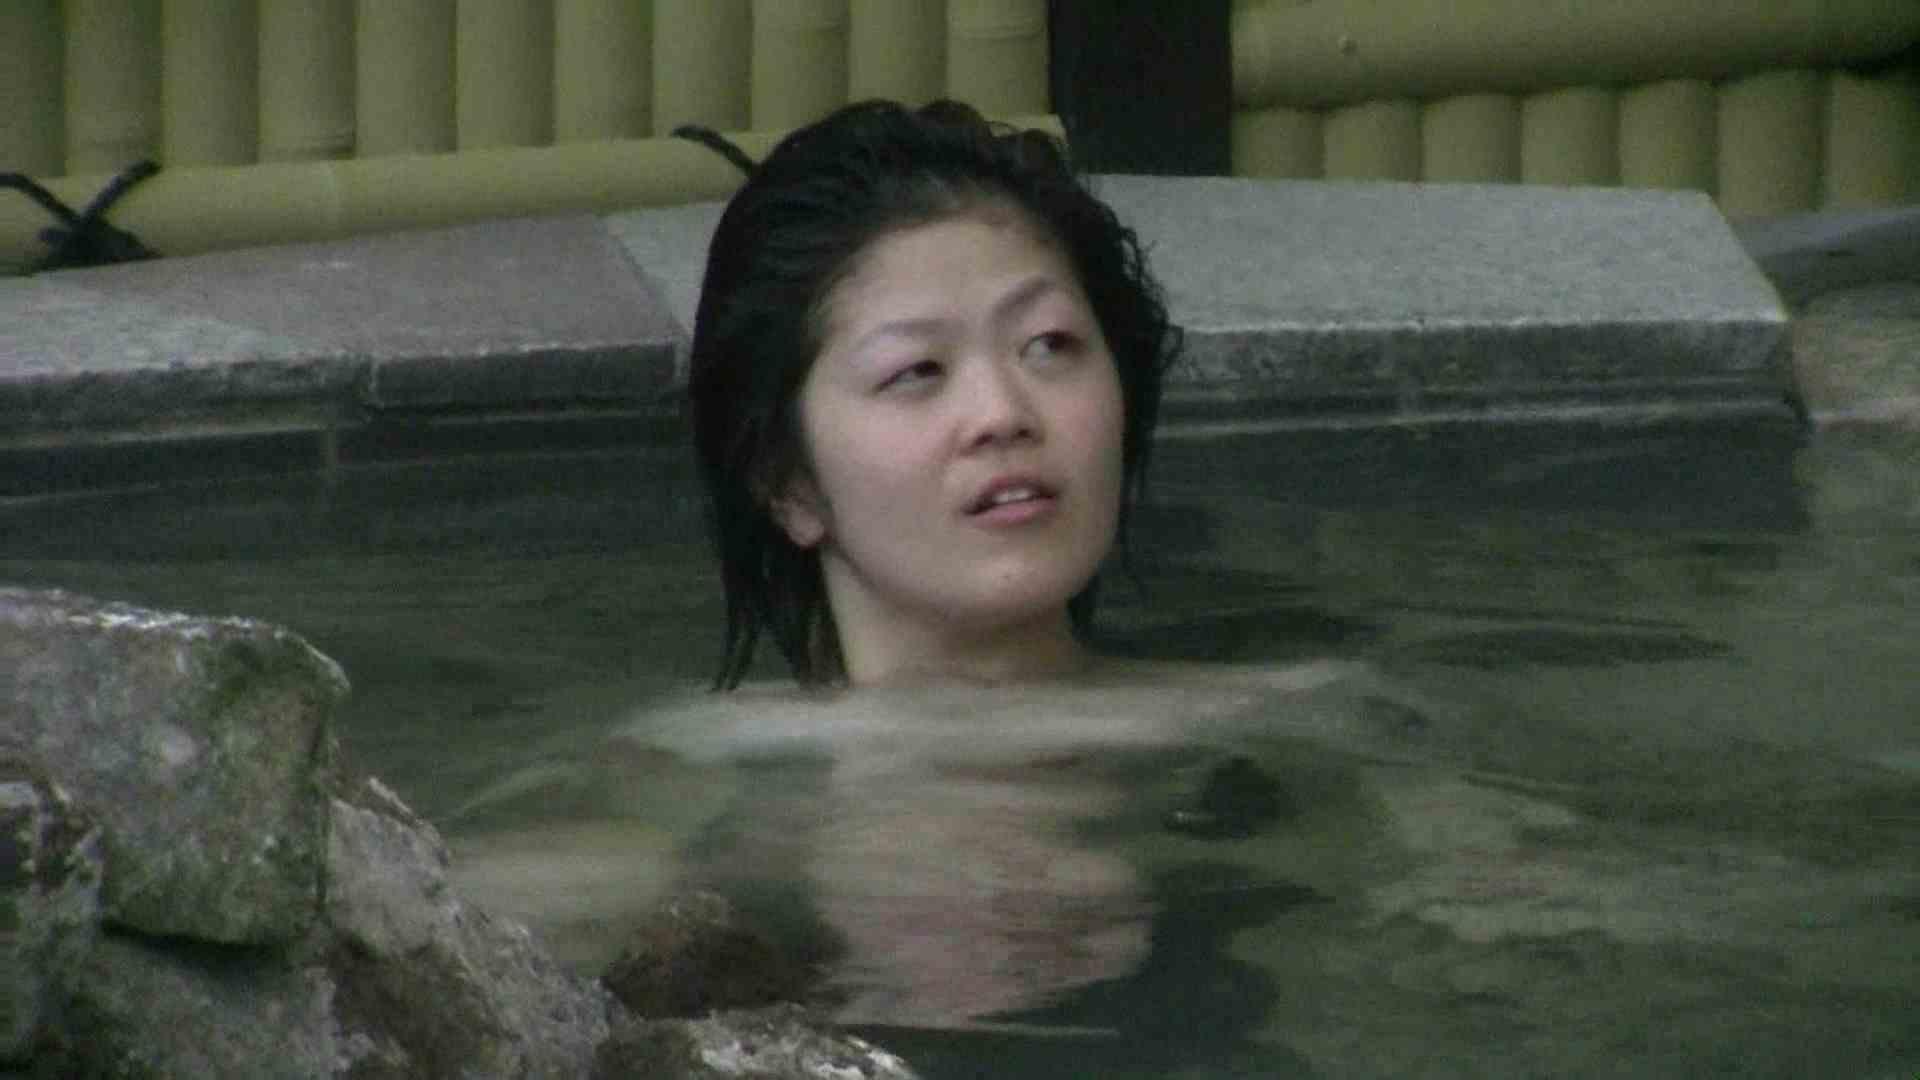 Aquaな露天風呂Vol.538 盗撮師作品 おめこ無修正動画無料 82pic 5